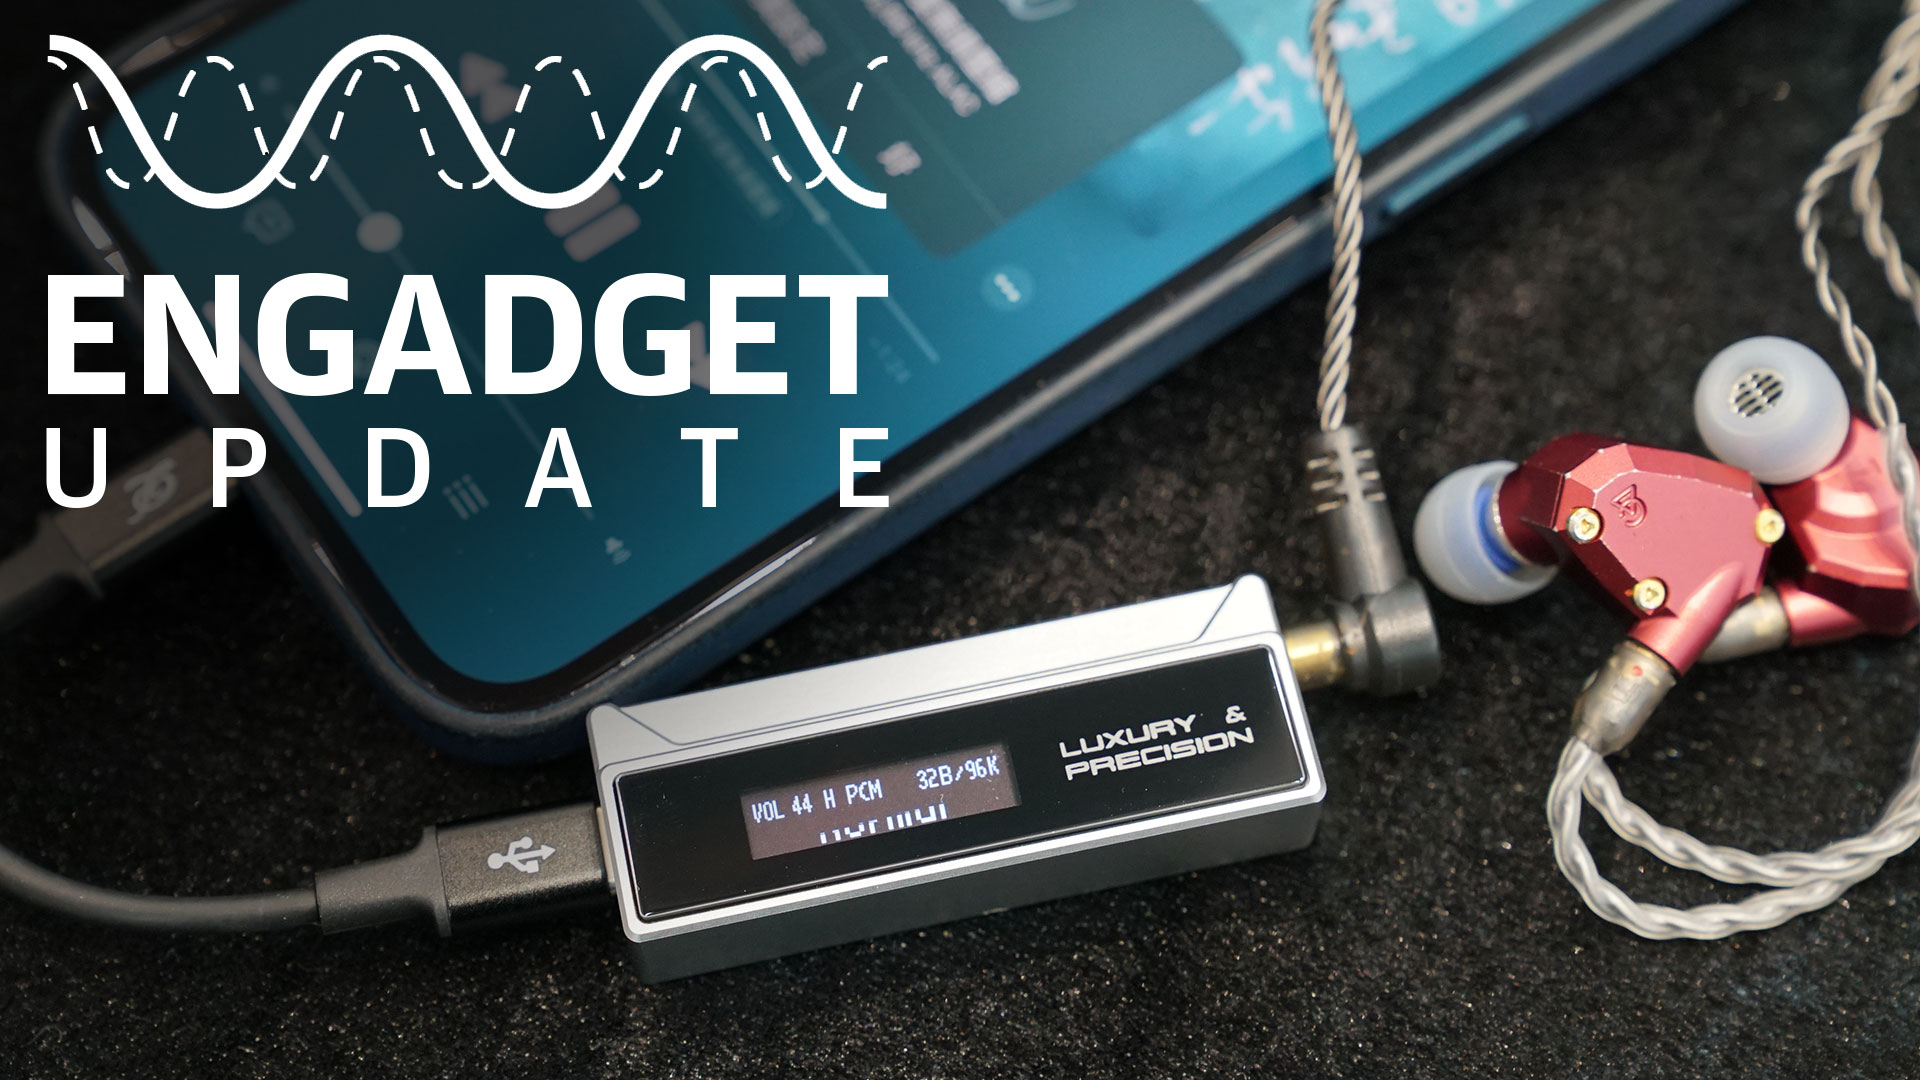 Engadget Update EP106